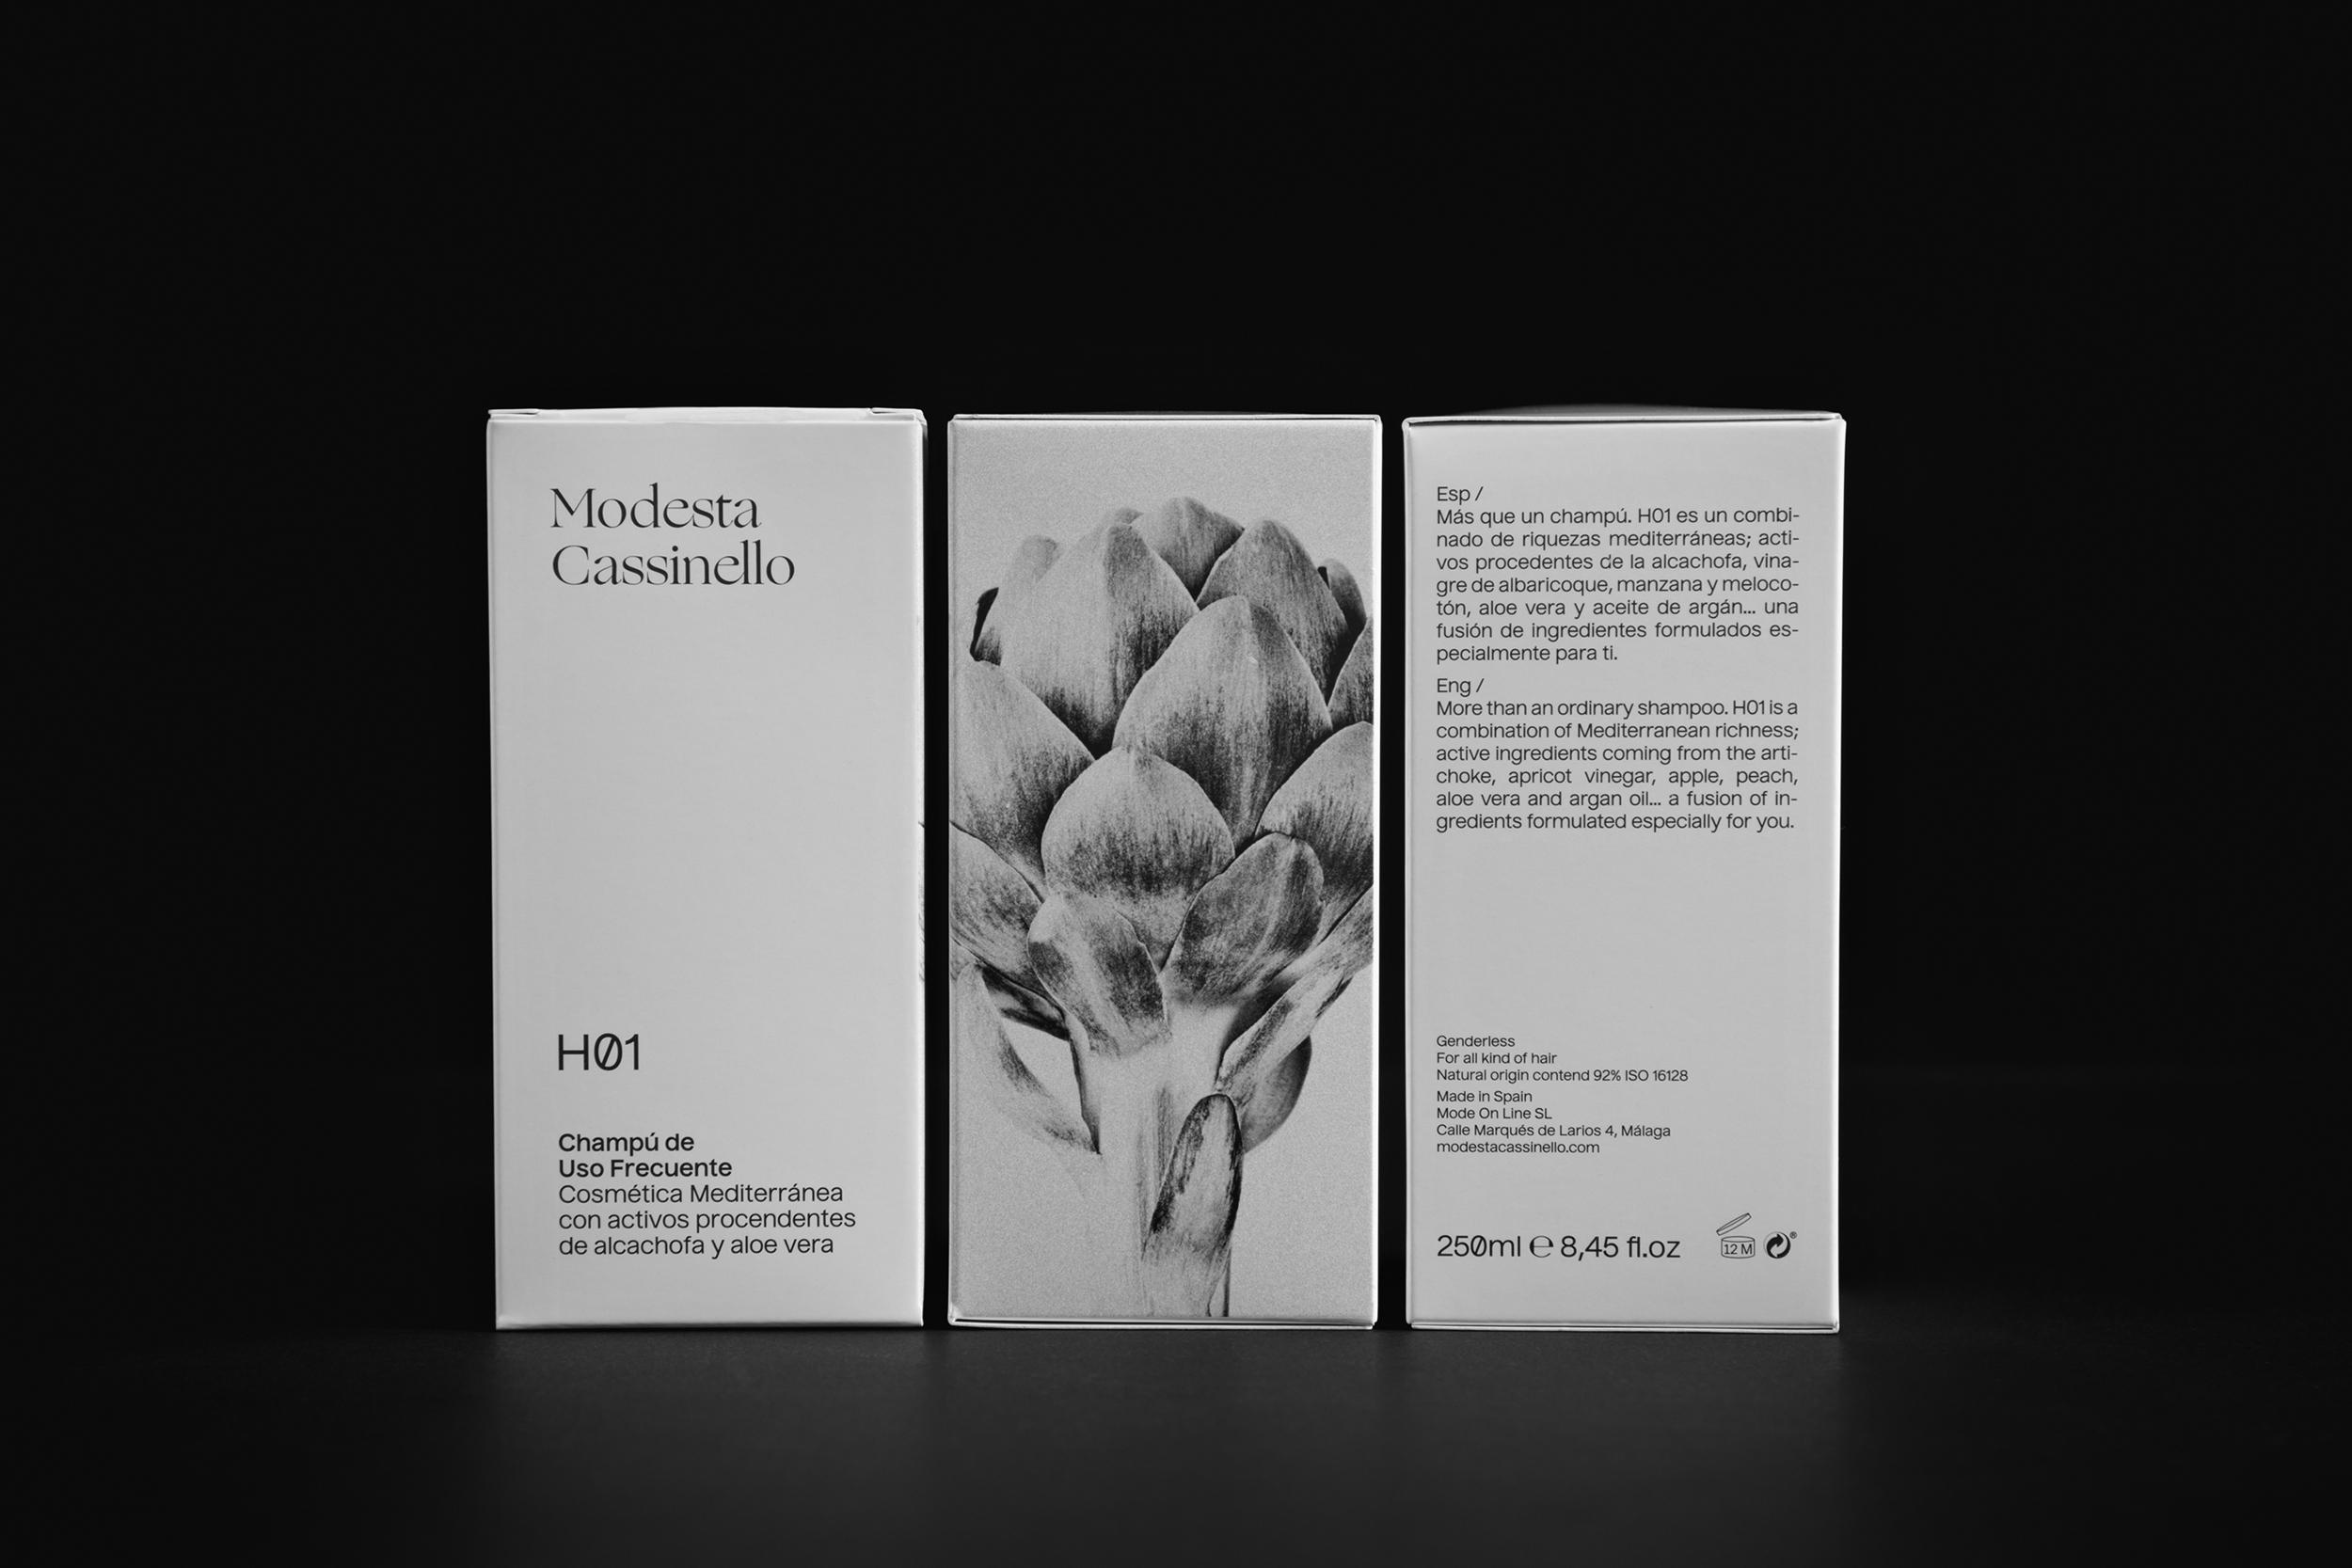 Modesta Cassinello An Honest Transparent and Open Cosmetics Company